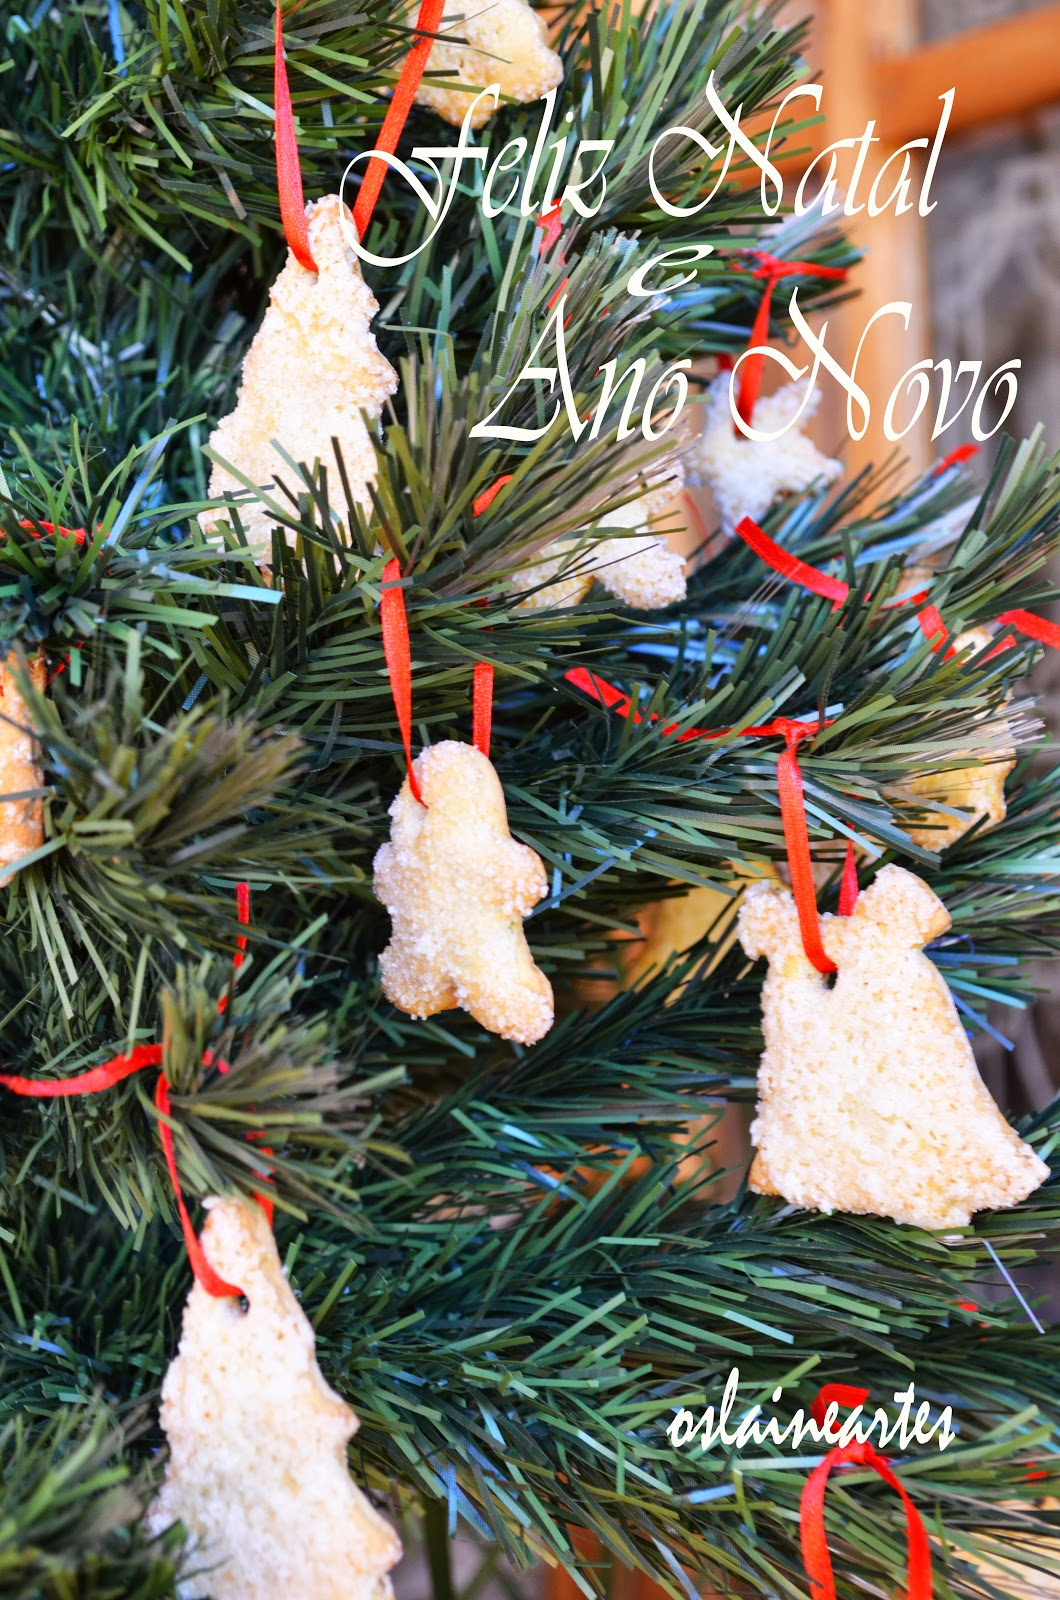 Biscoitos para Decorar a Árvore de Natal